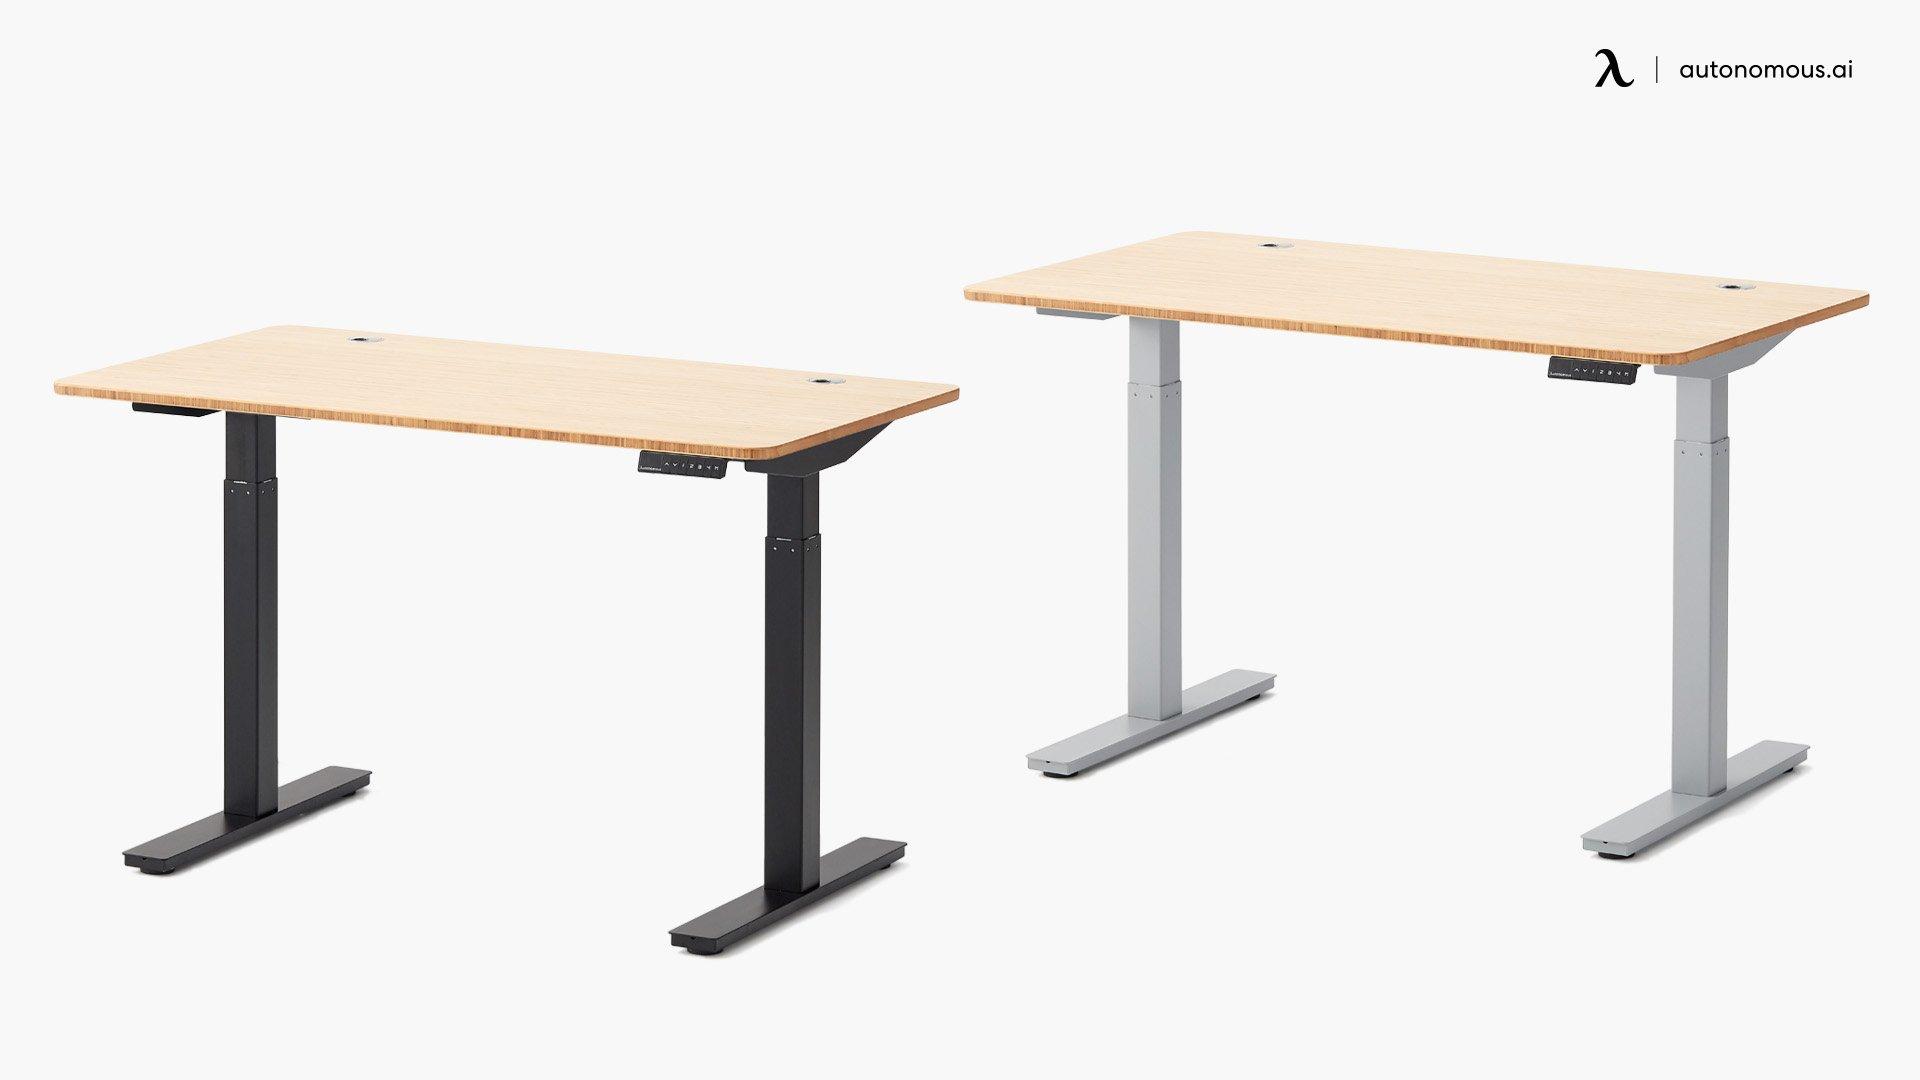 The SmartDesk 2 Bamboo Adjustable Desk